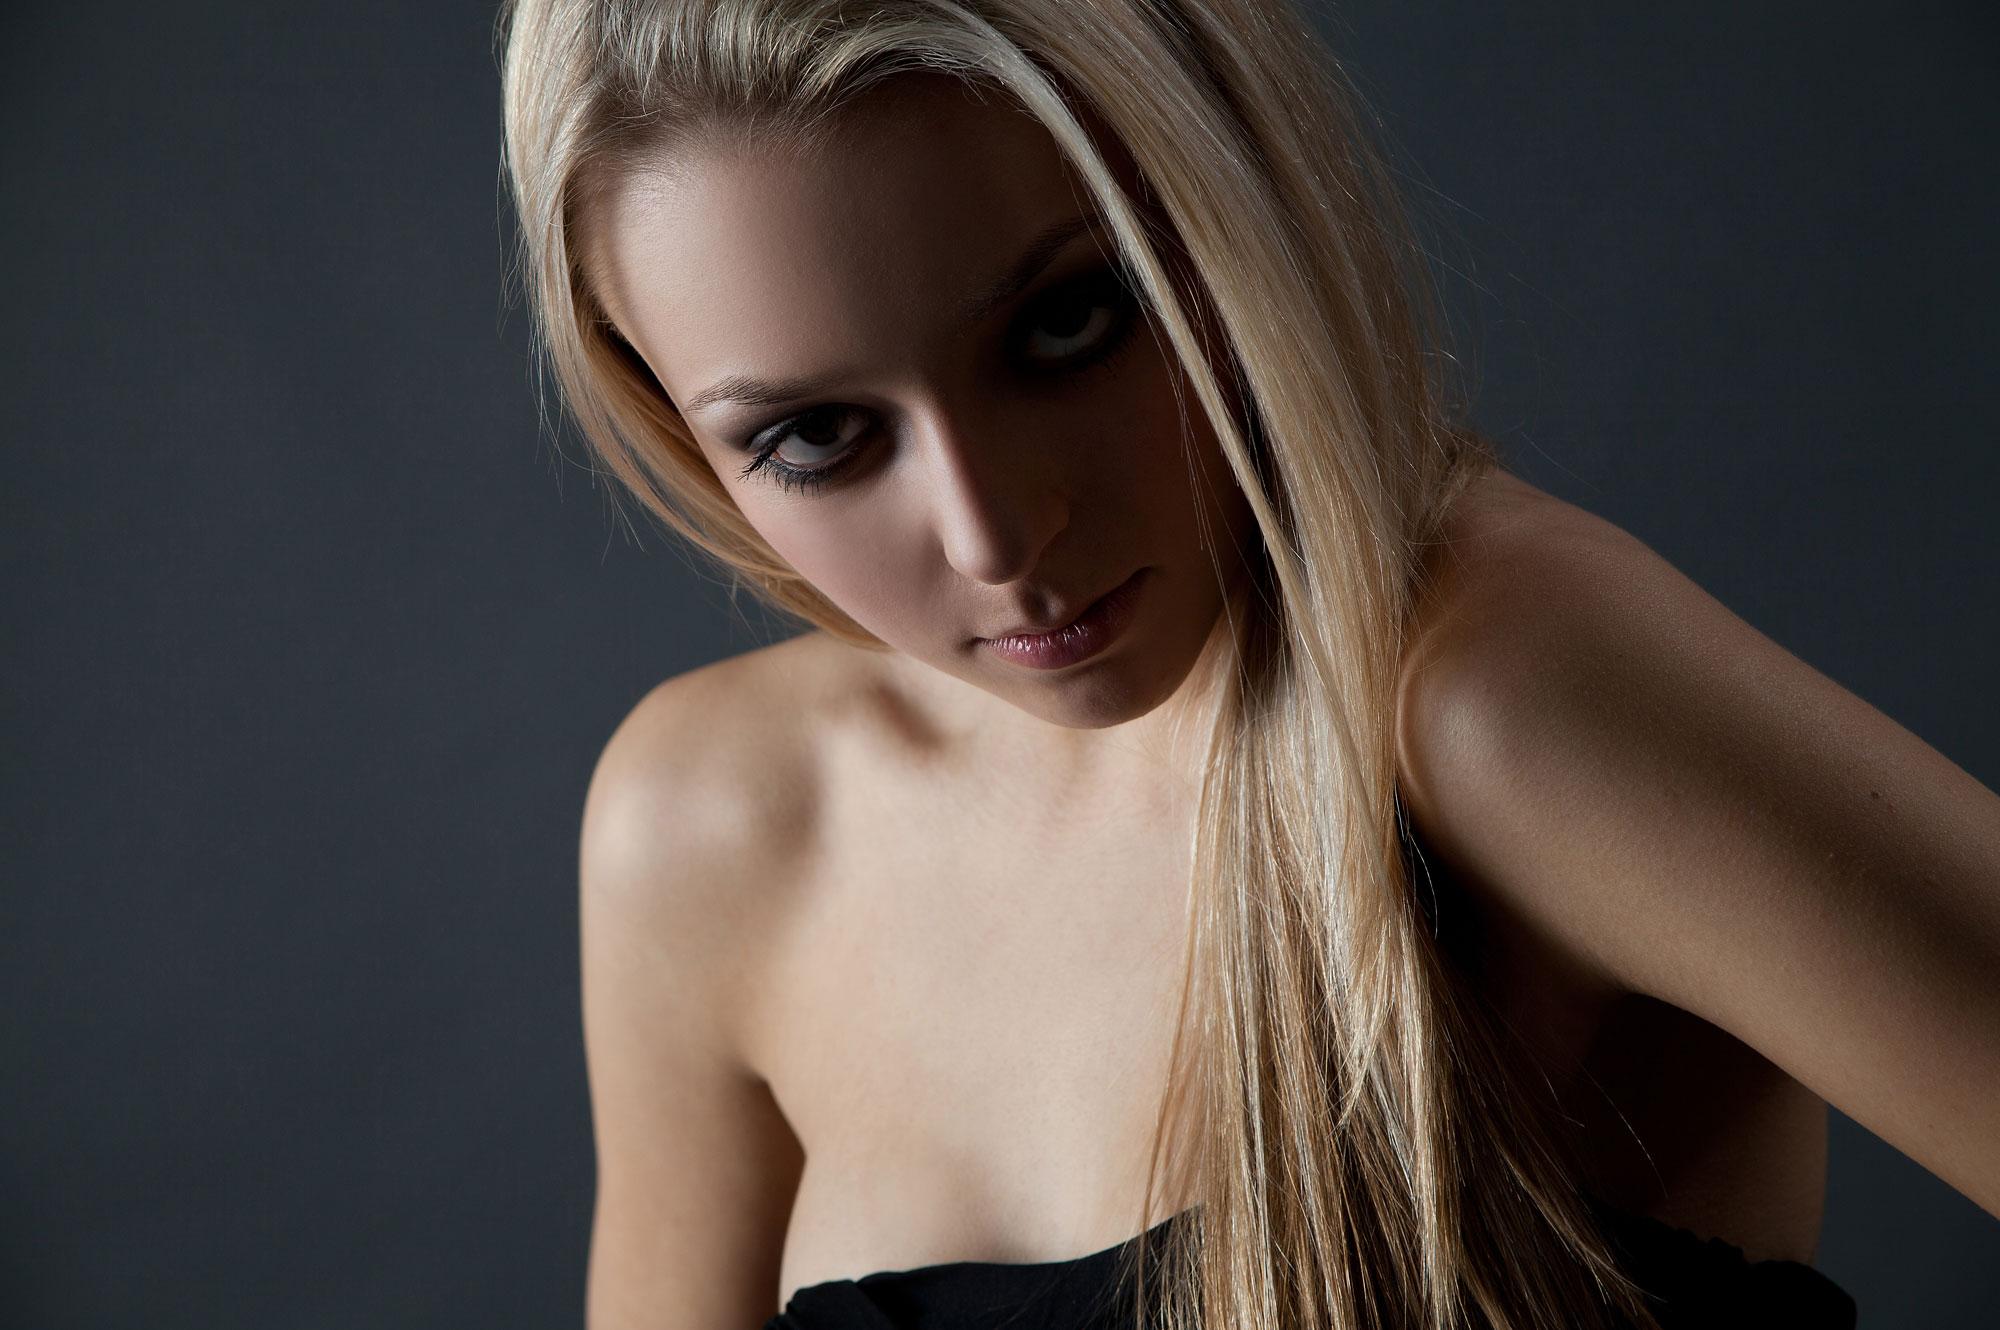 Modelaufnahme im Studio